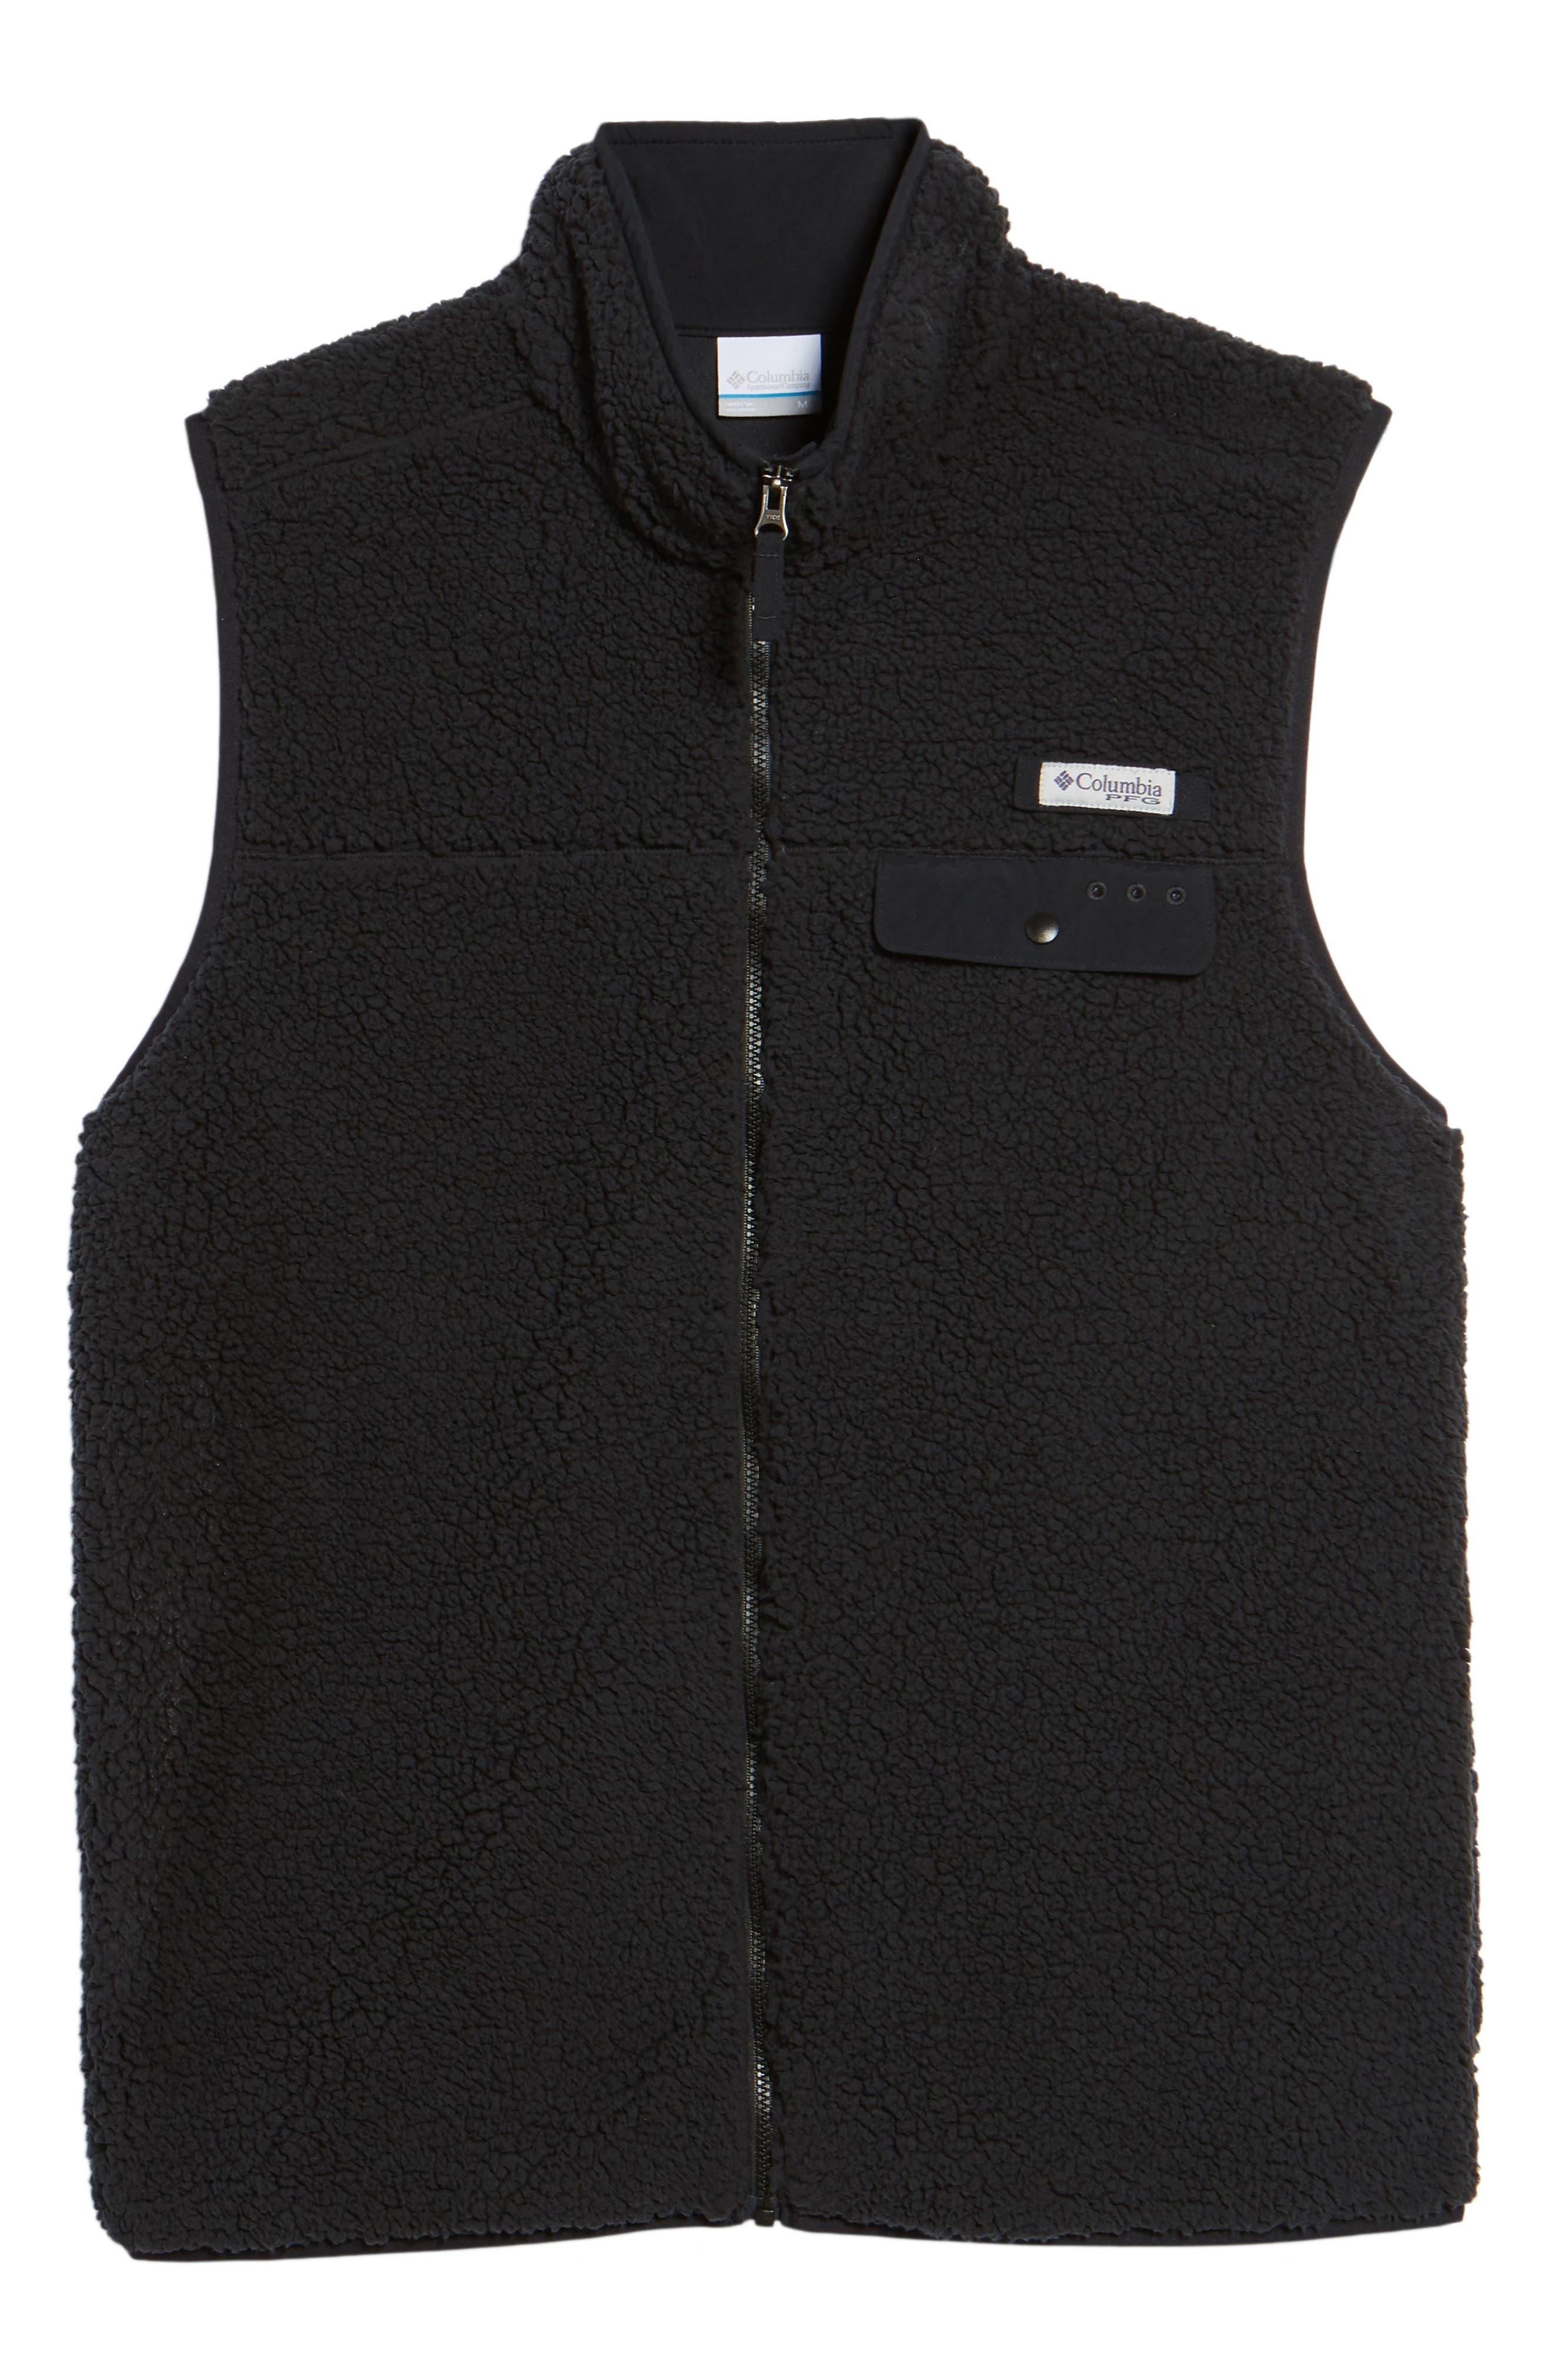 Sportswear Harborside Heavyweight Fleece Vest,                             Alternate thumbnail 5, color,                             010